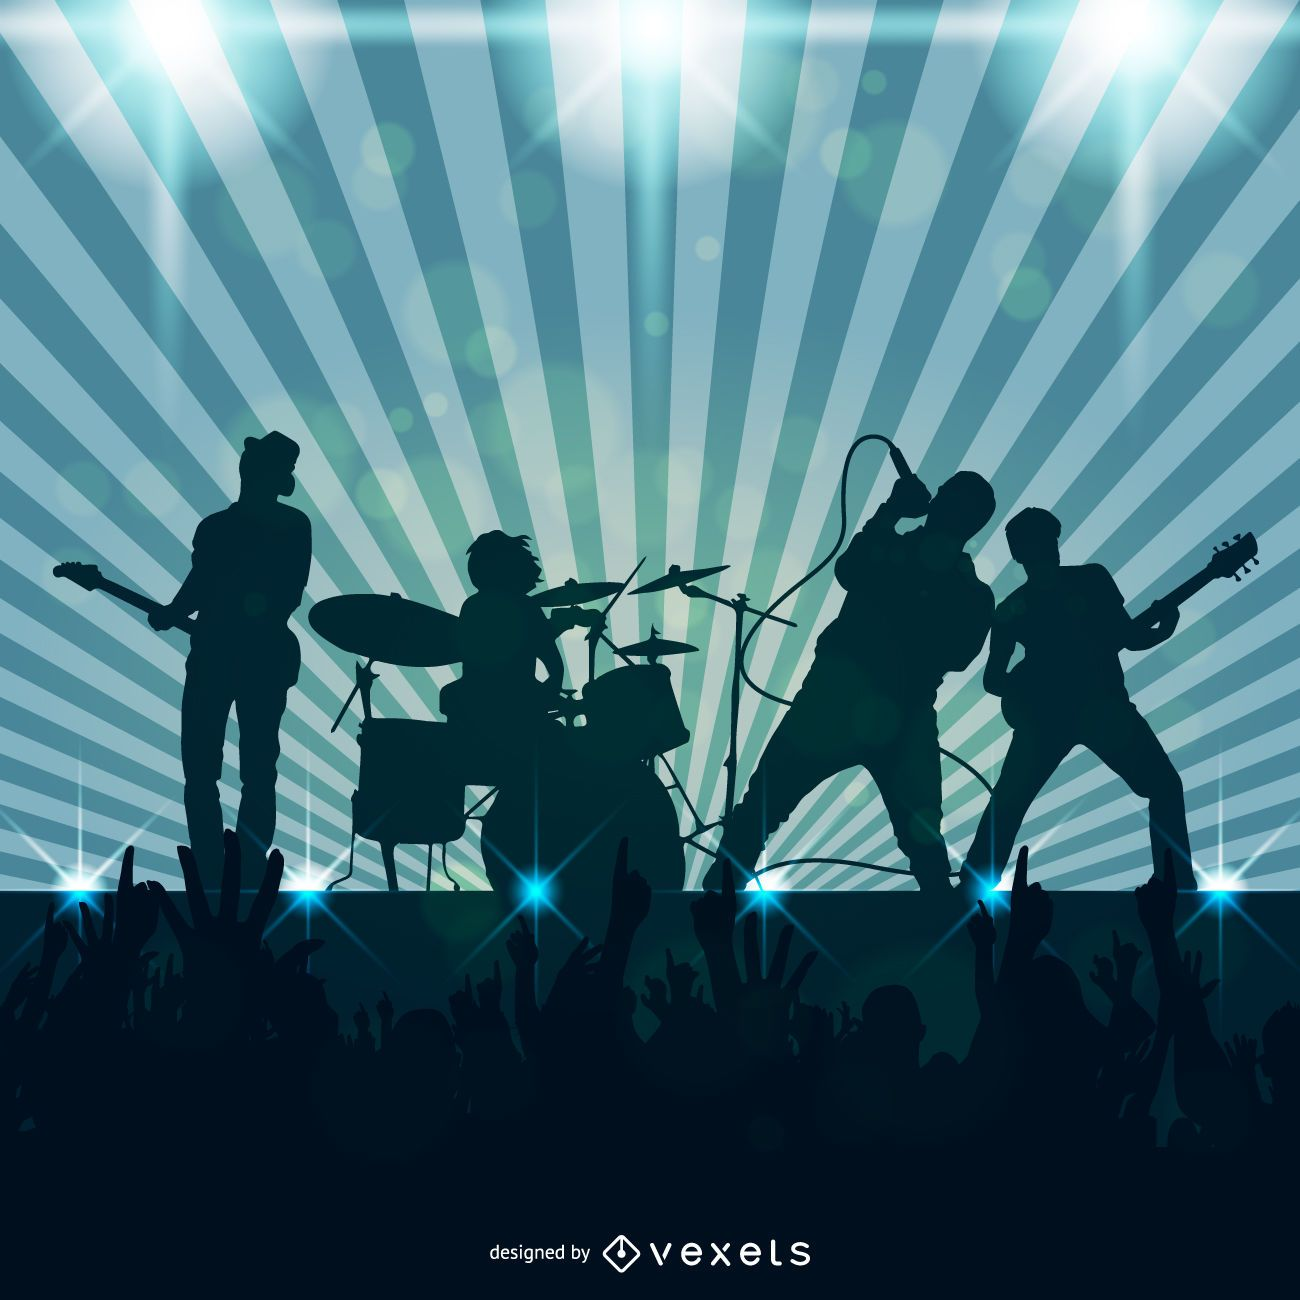 Rock band playing illustration